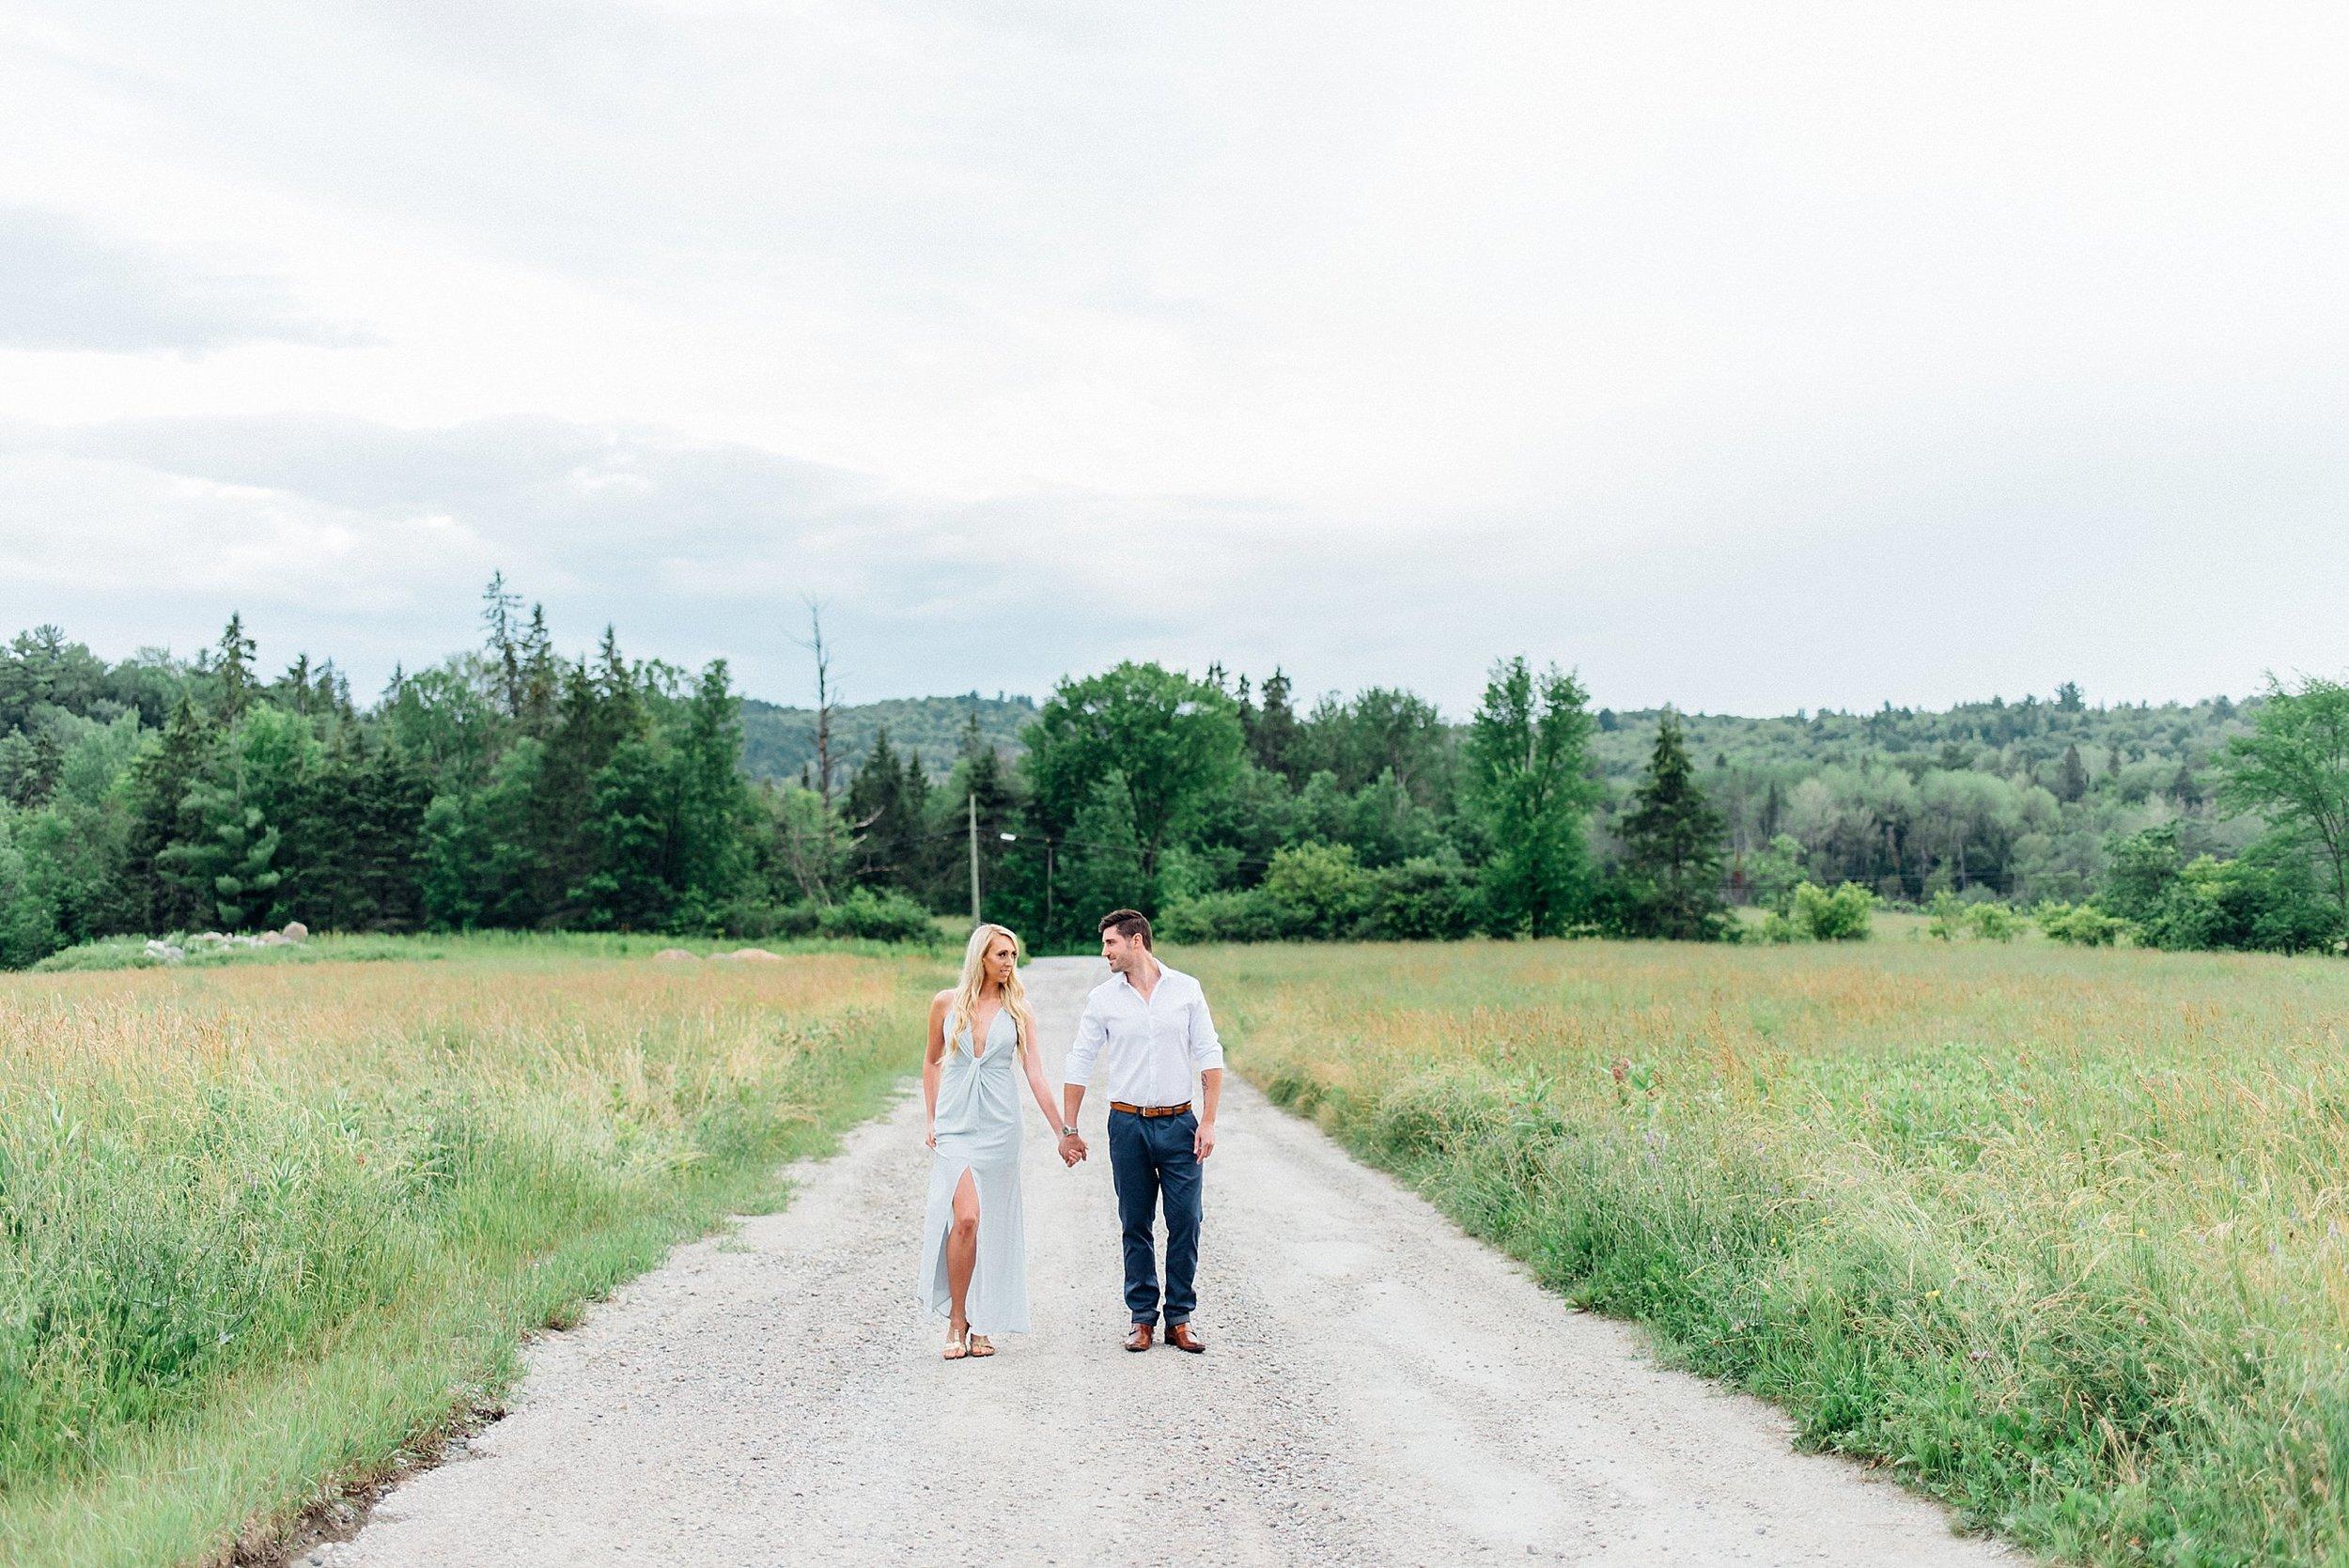 Ali and Batoul Photography - light, airy, indie documentary Ottawa wedding photographer_0031.jpg